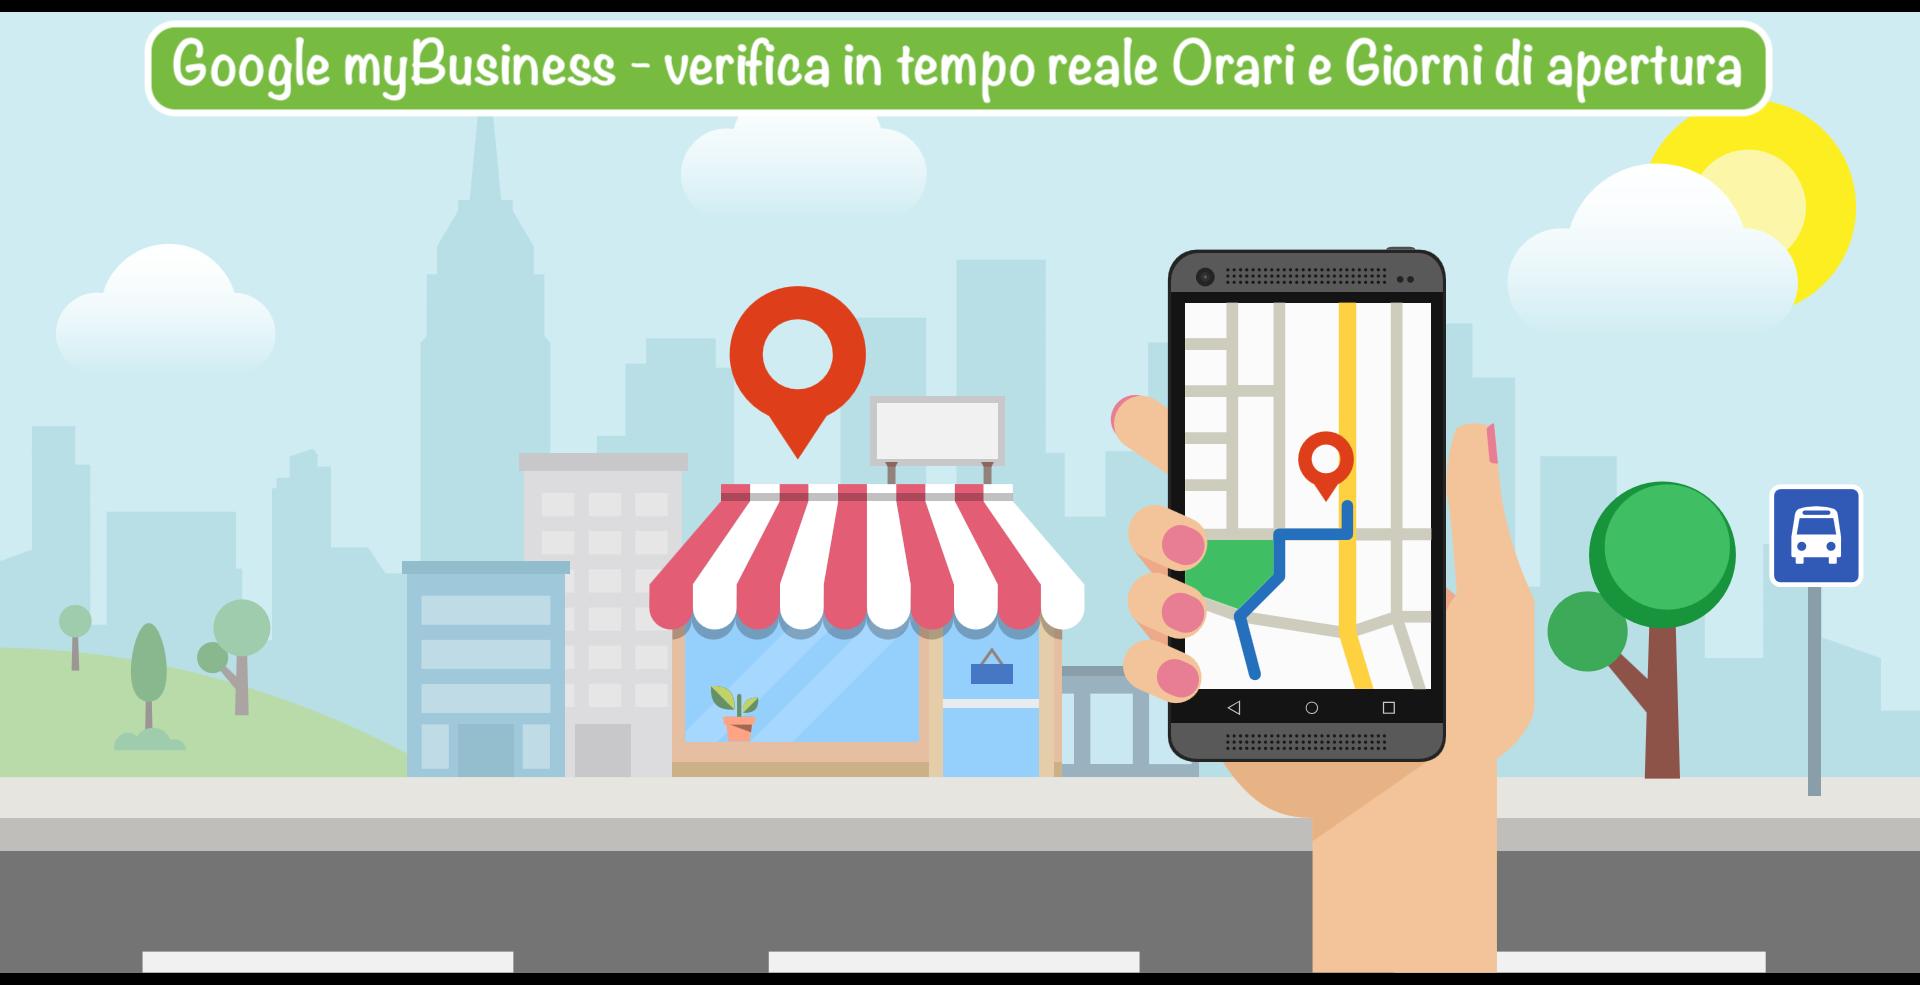 Cs, CAREservice google-my-business-orari-1920 Contatti